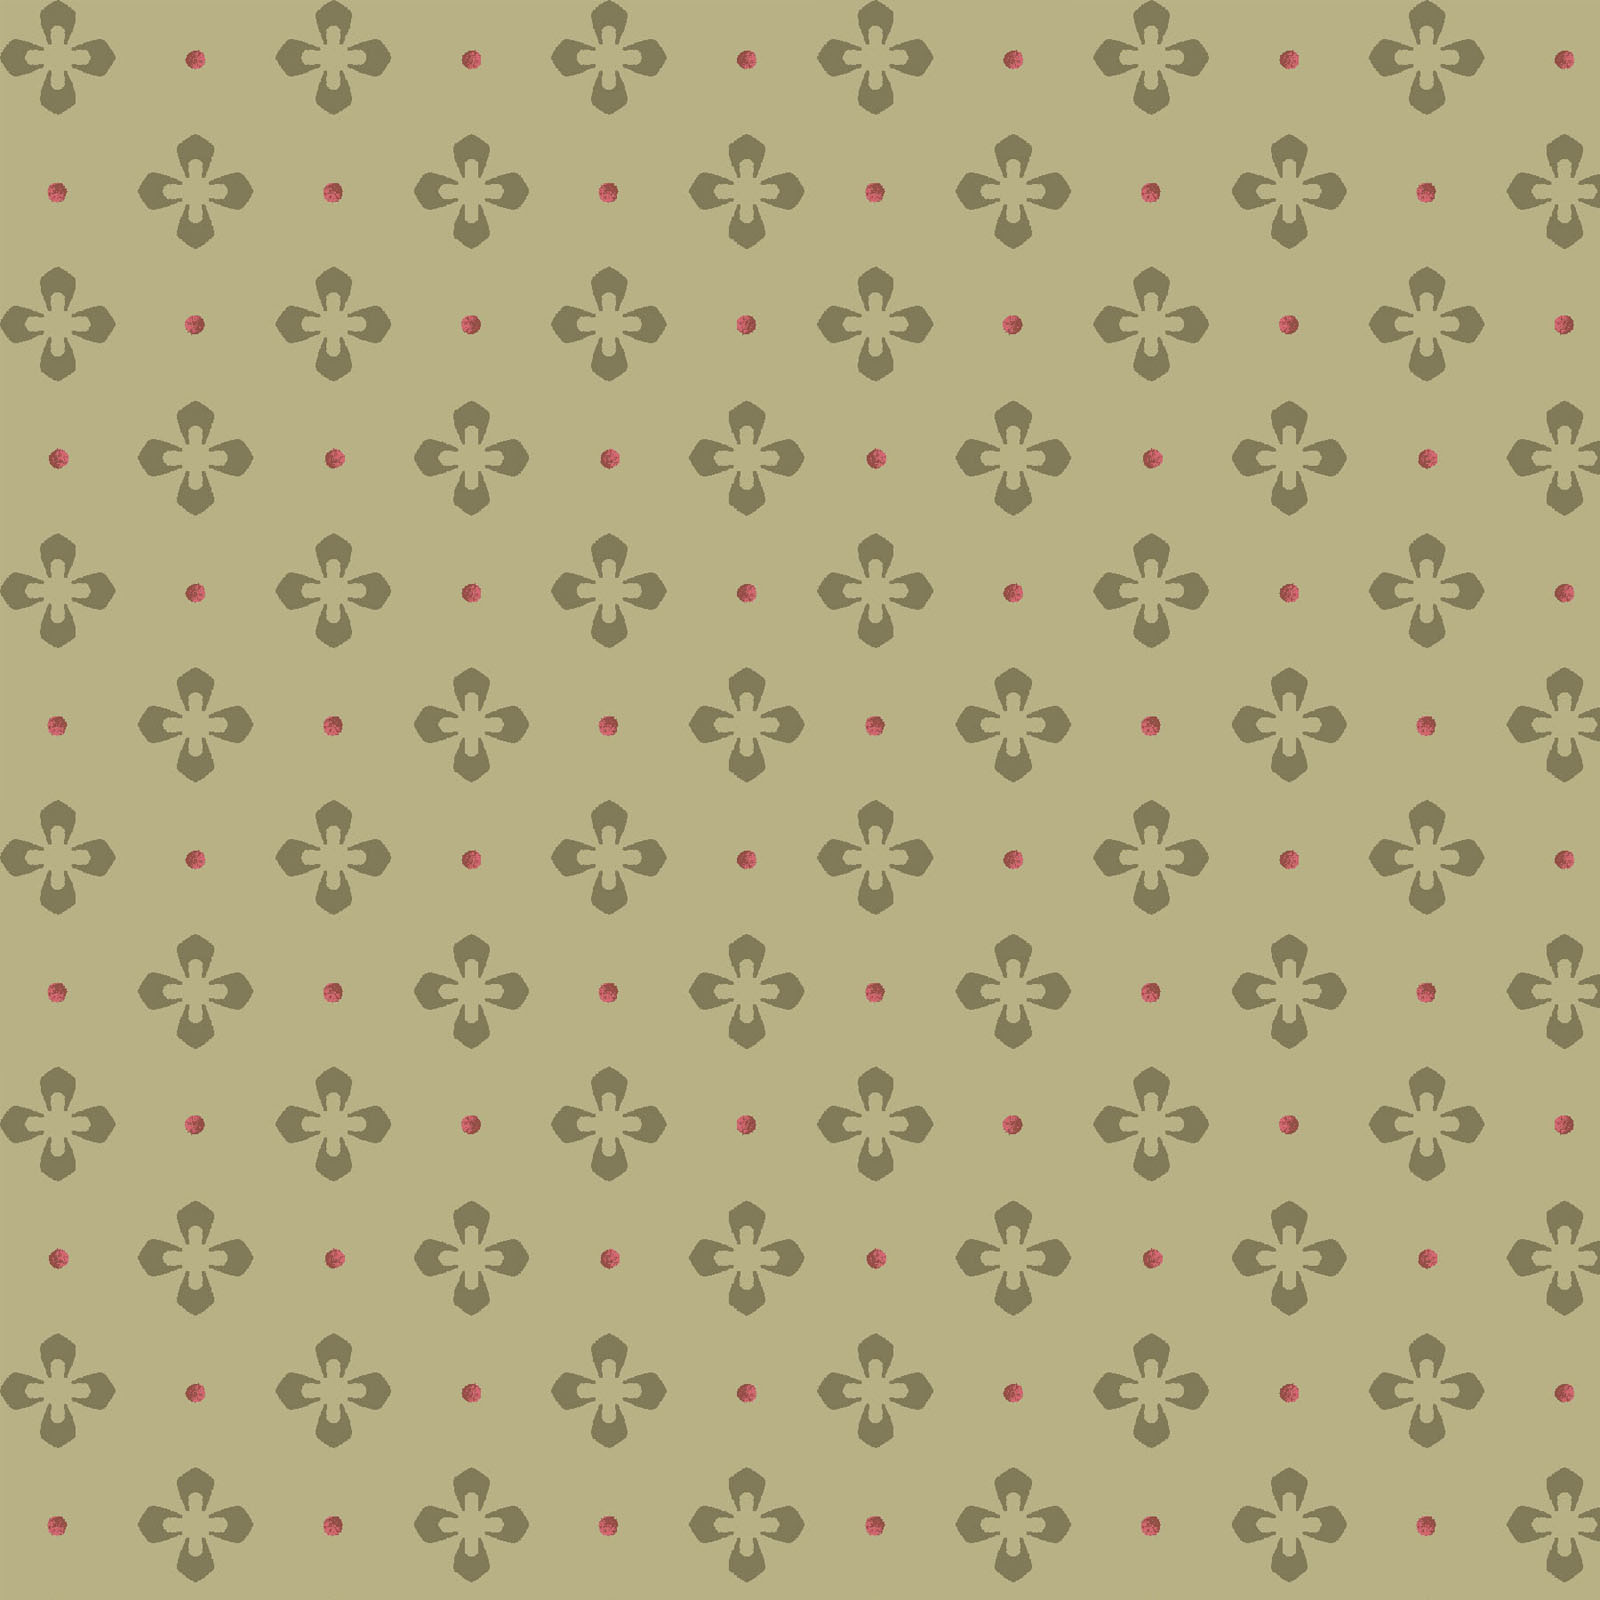 MAYWOOD BURGUNDY & BLUSH, FOULARD DOT (Green), Per cm or $18/m